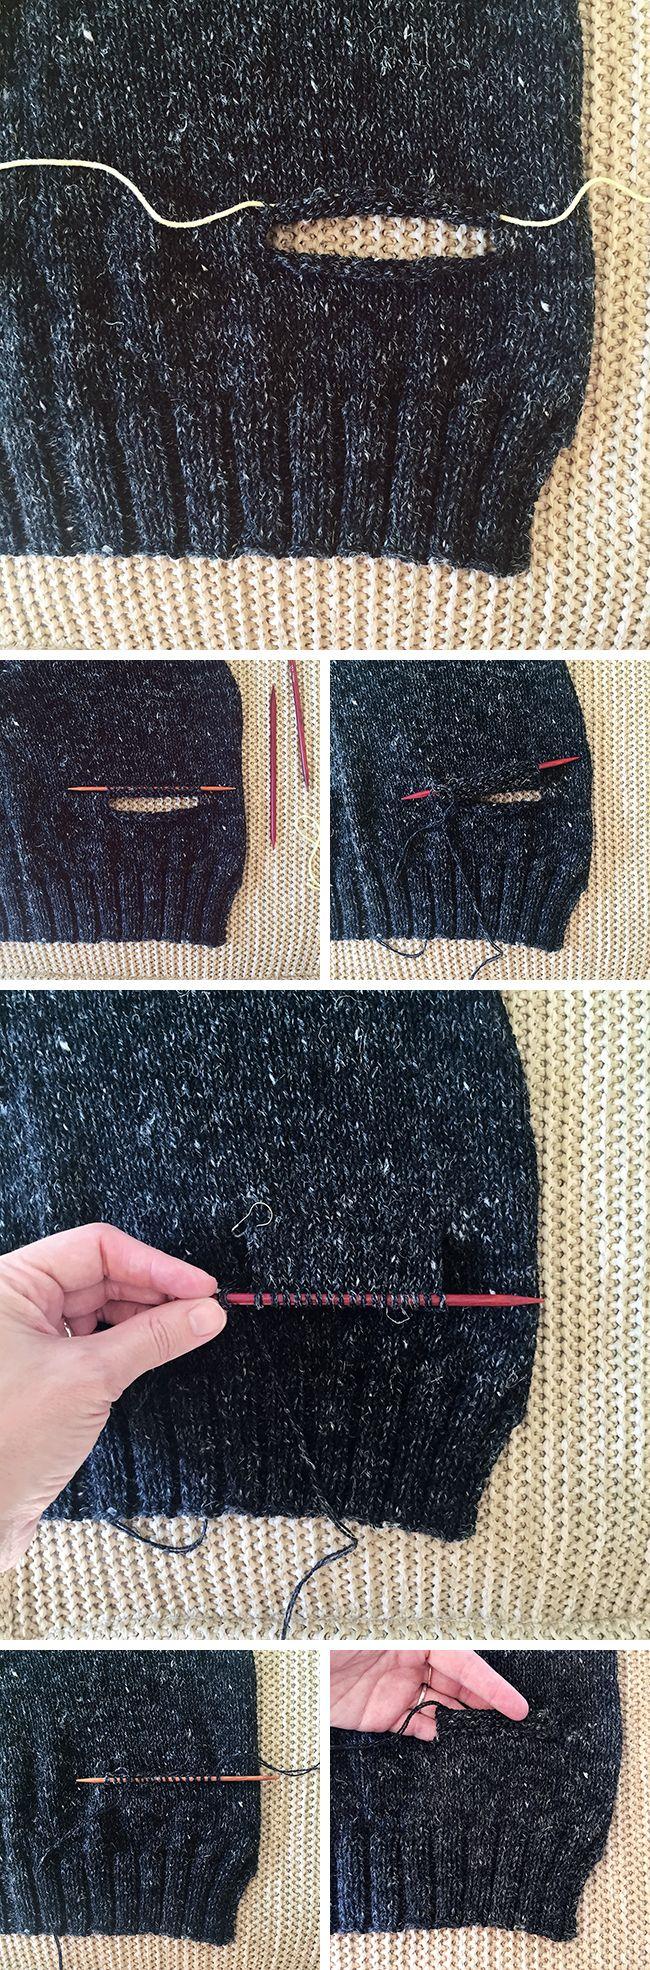 f29f40b8b0c6 How to knit inset pockets (top-down